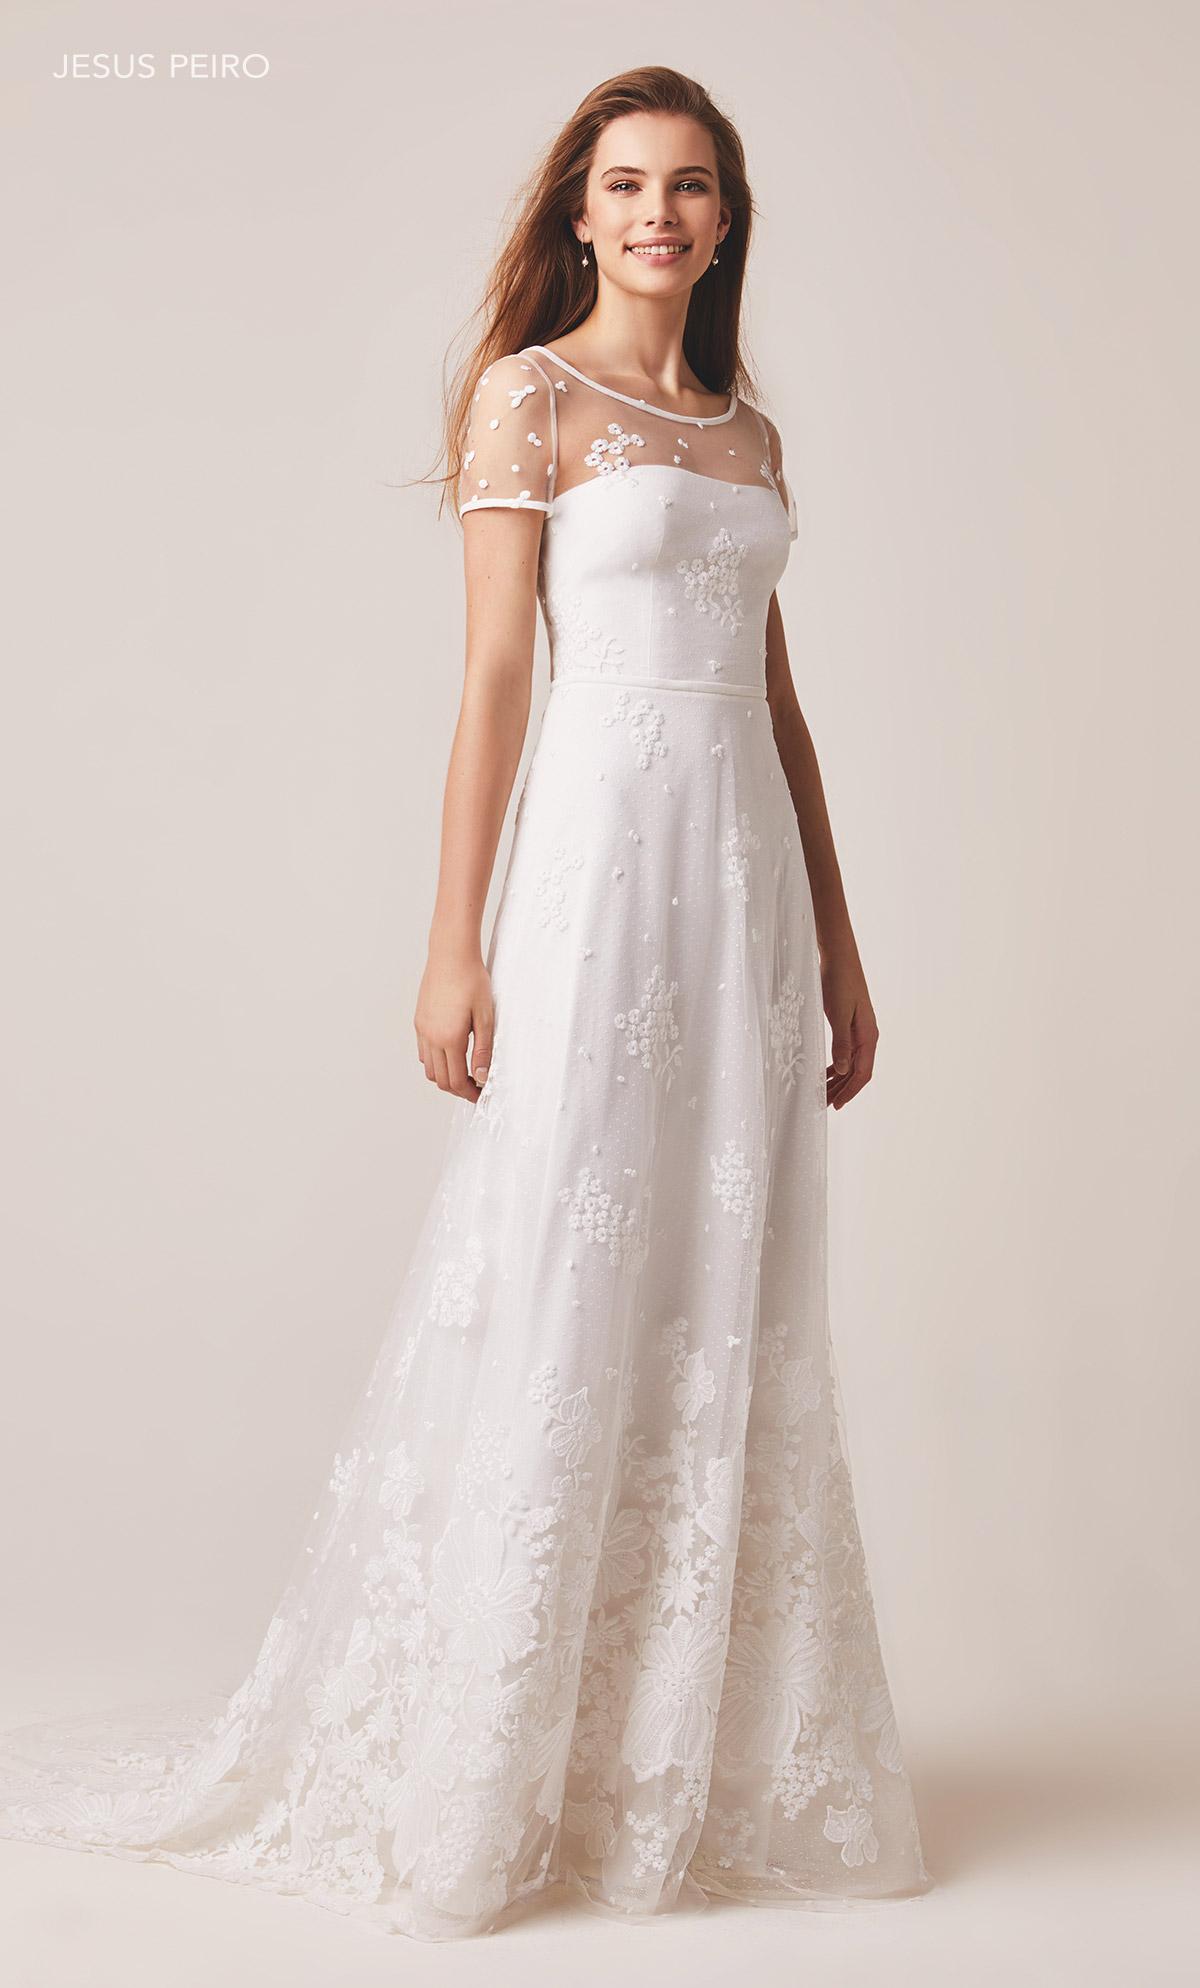 Vestido novia Jesús Peiró Ref.124